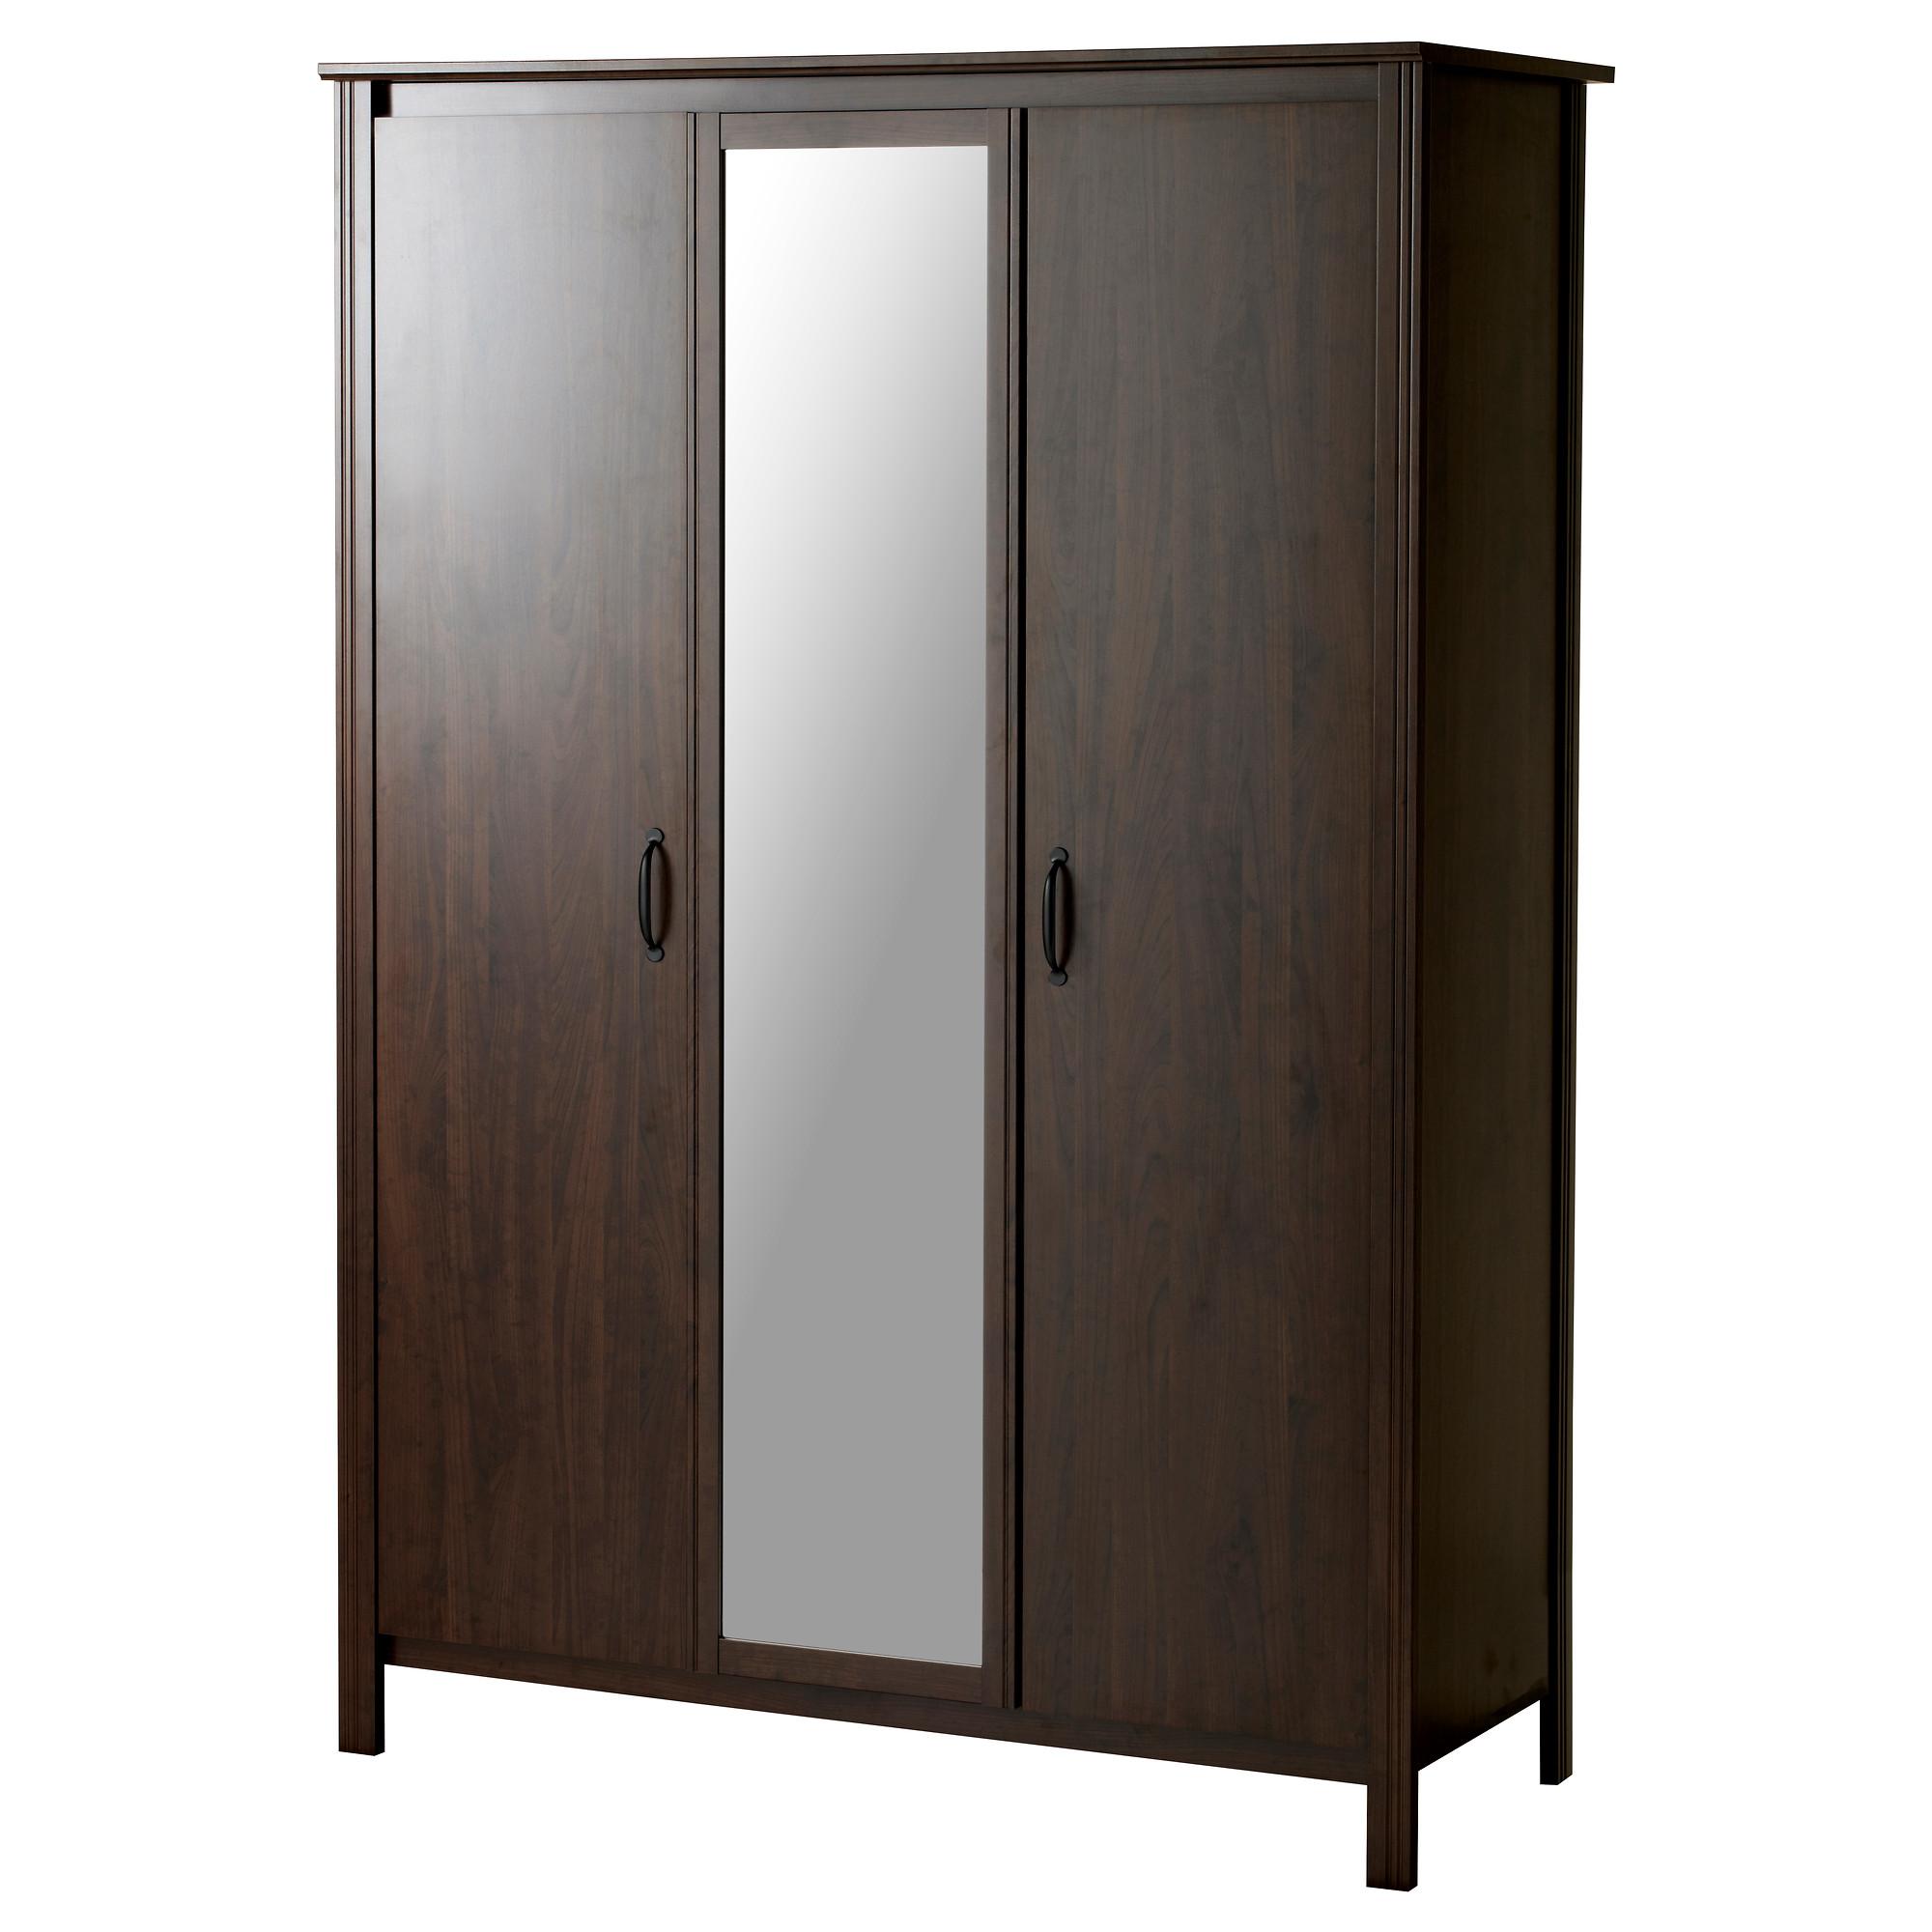 wardrobe armoire brusali wardrobe with 3 doors, brown width: 51 5/8  FJNXEAT